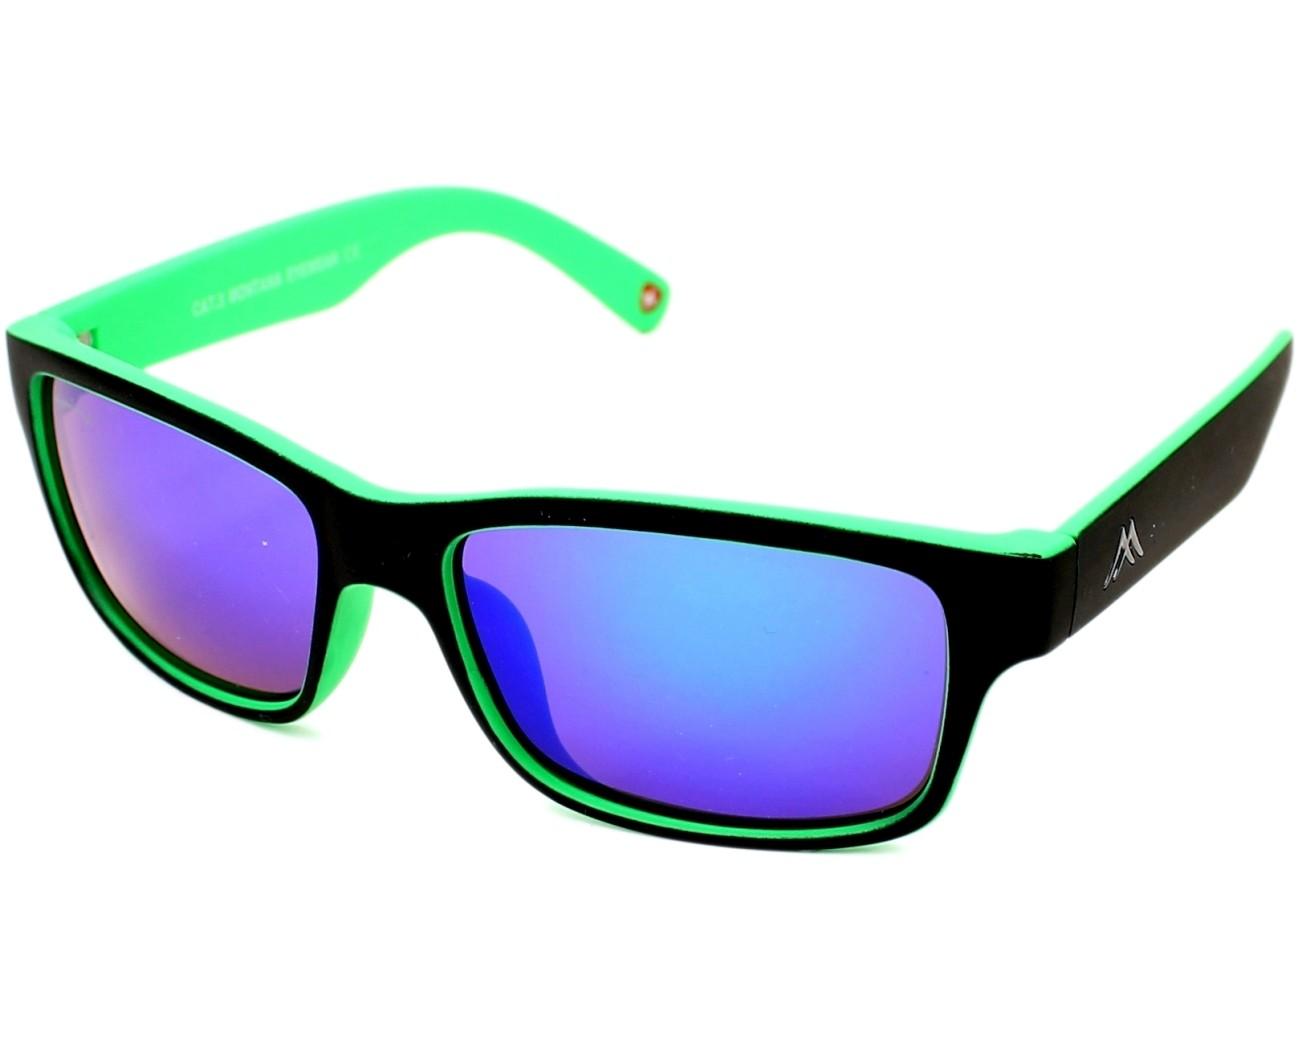 89d9faaad8527 Lunettes de soleil Montana MS-27 E 57-18 Noir Vert vue de profil